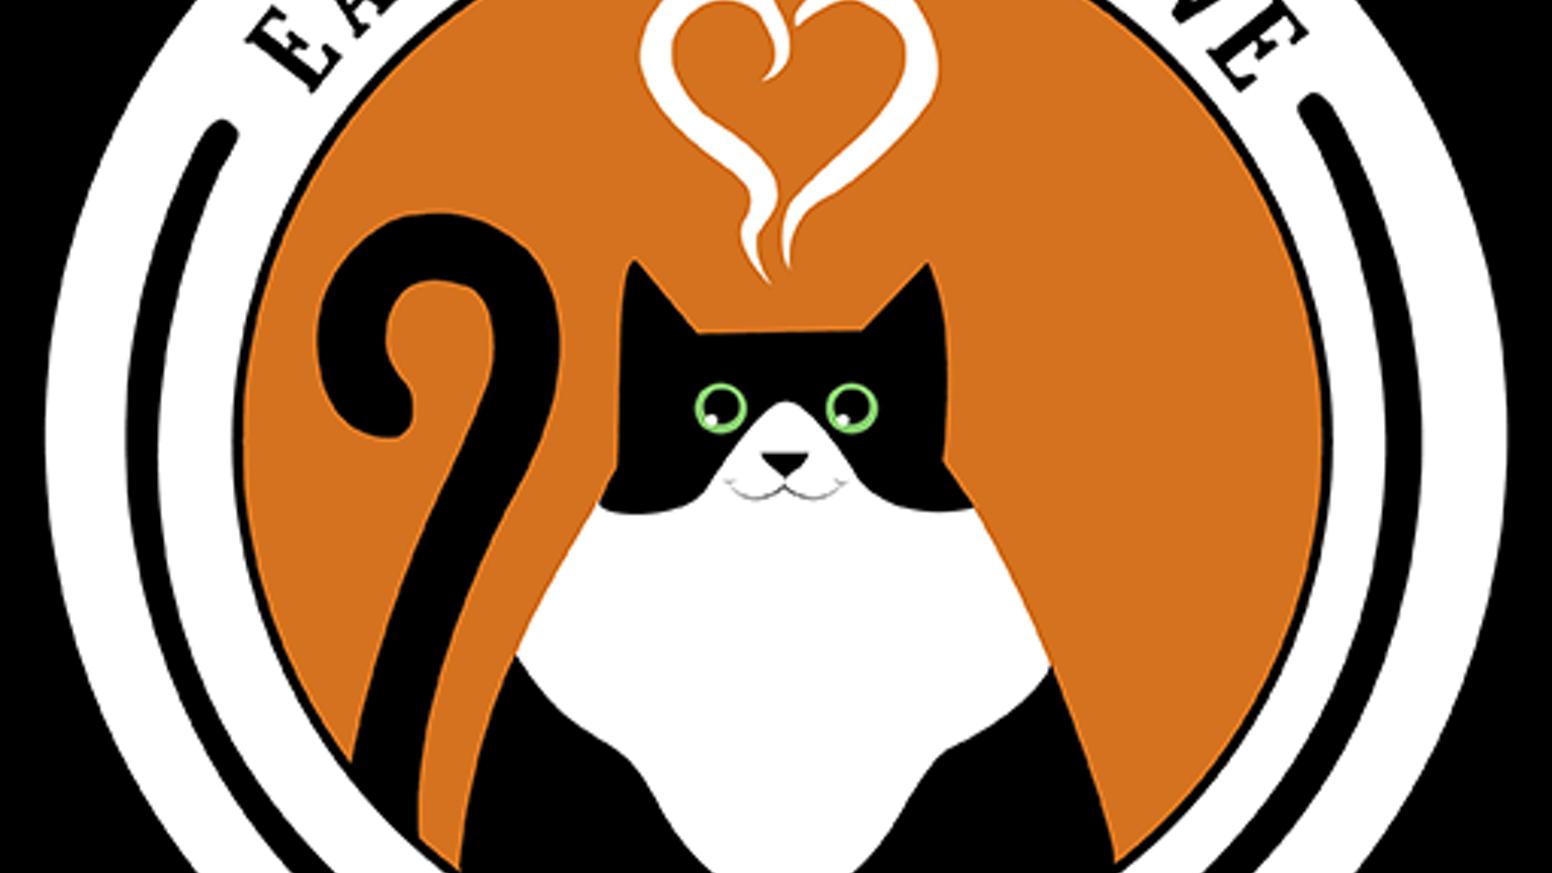 Kitten clipart purr. Eat love central oh